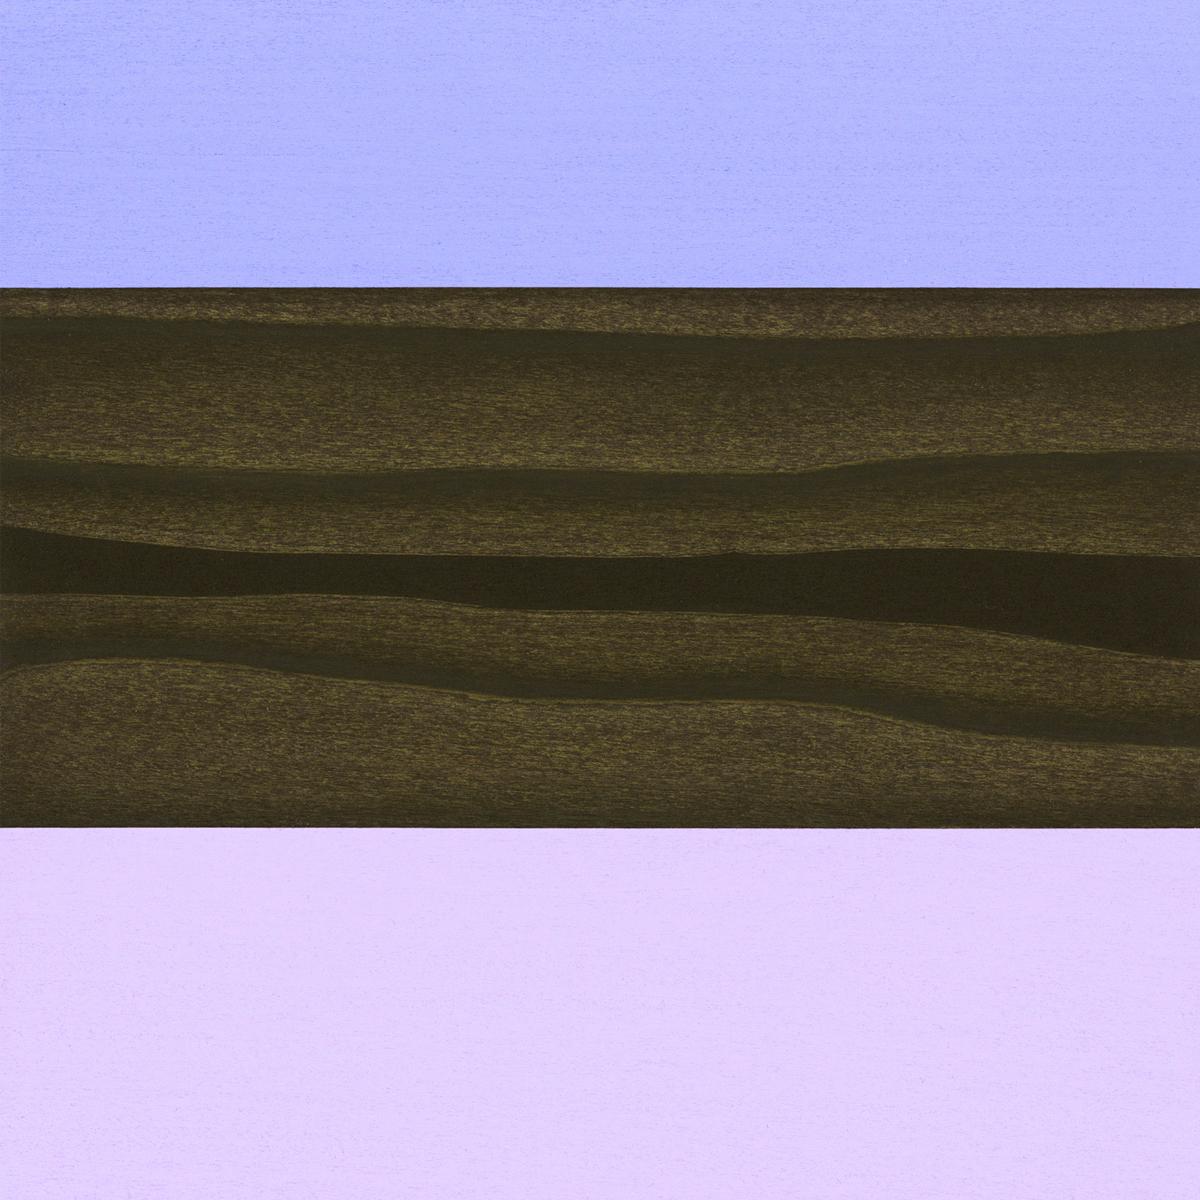 "Saint #5  Gouache / Ink / Charcoal / Wood    11.25"" x 11.25"" x 1""      2009"